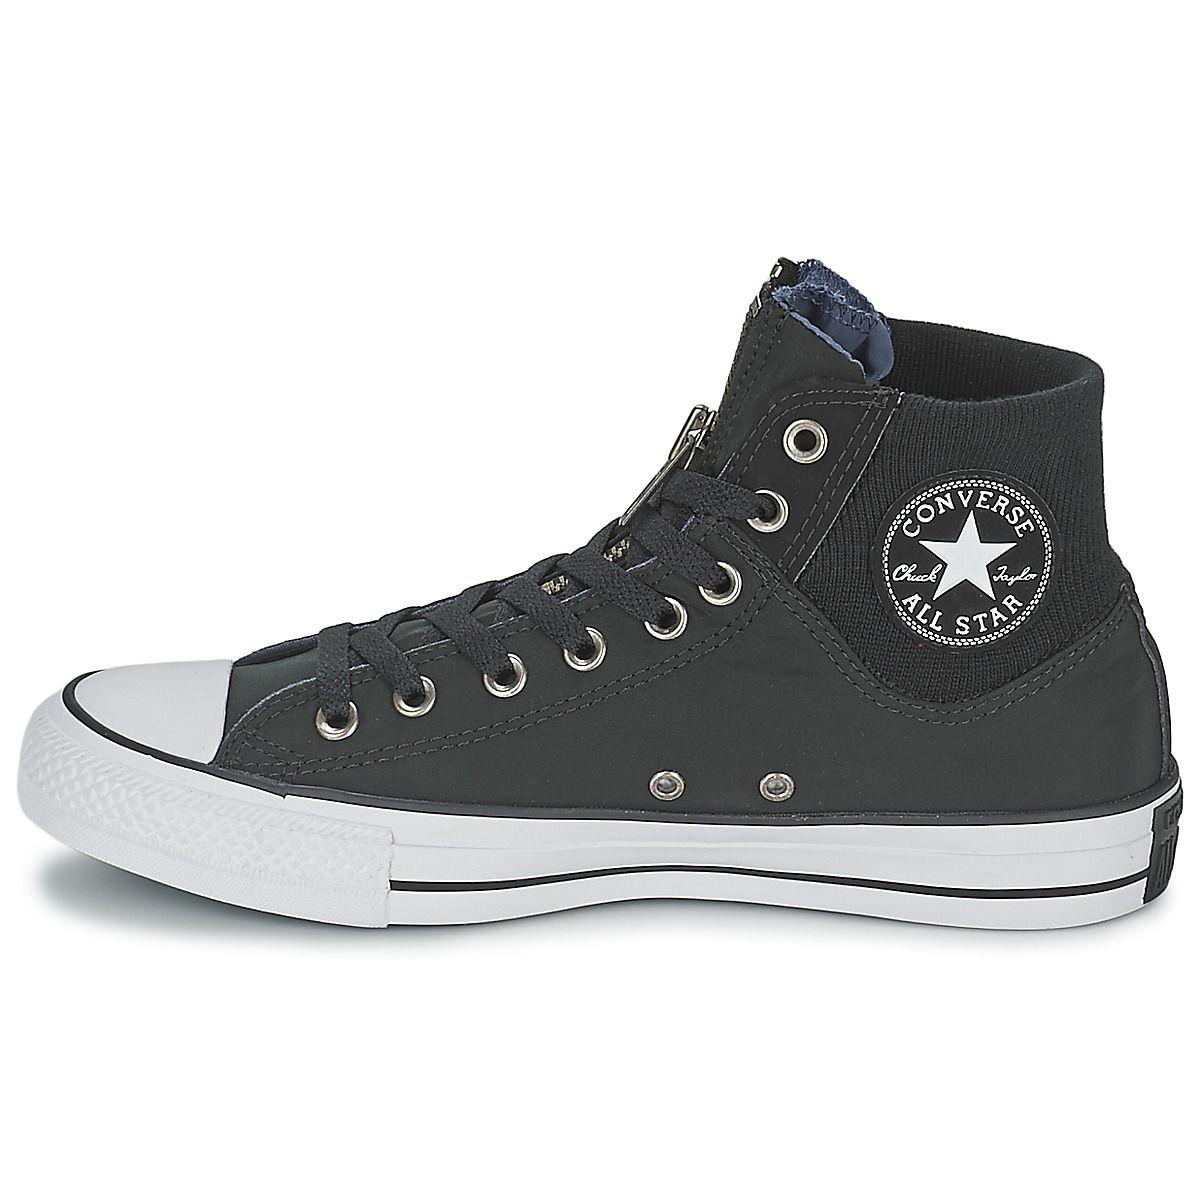 Converse CHUCK TAYLOR ALL STAR HERRINGBONE - HI - Baskets montantes gris FAtUlnQJH